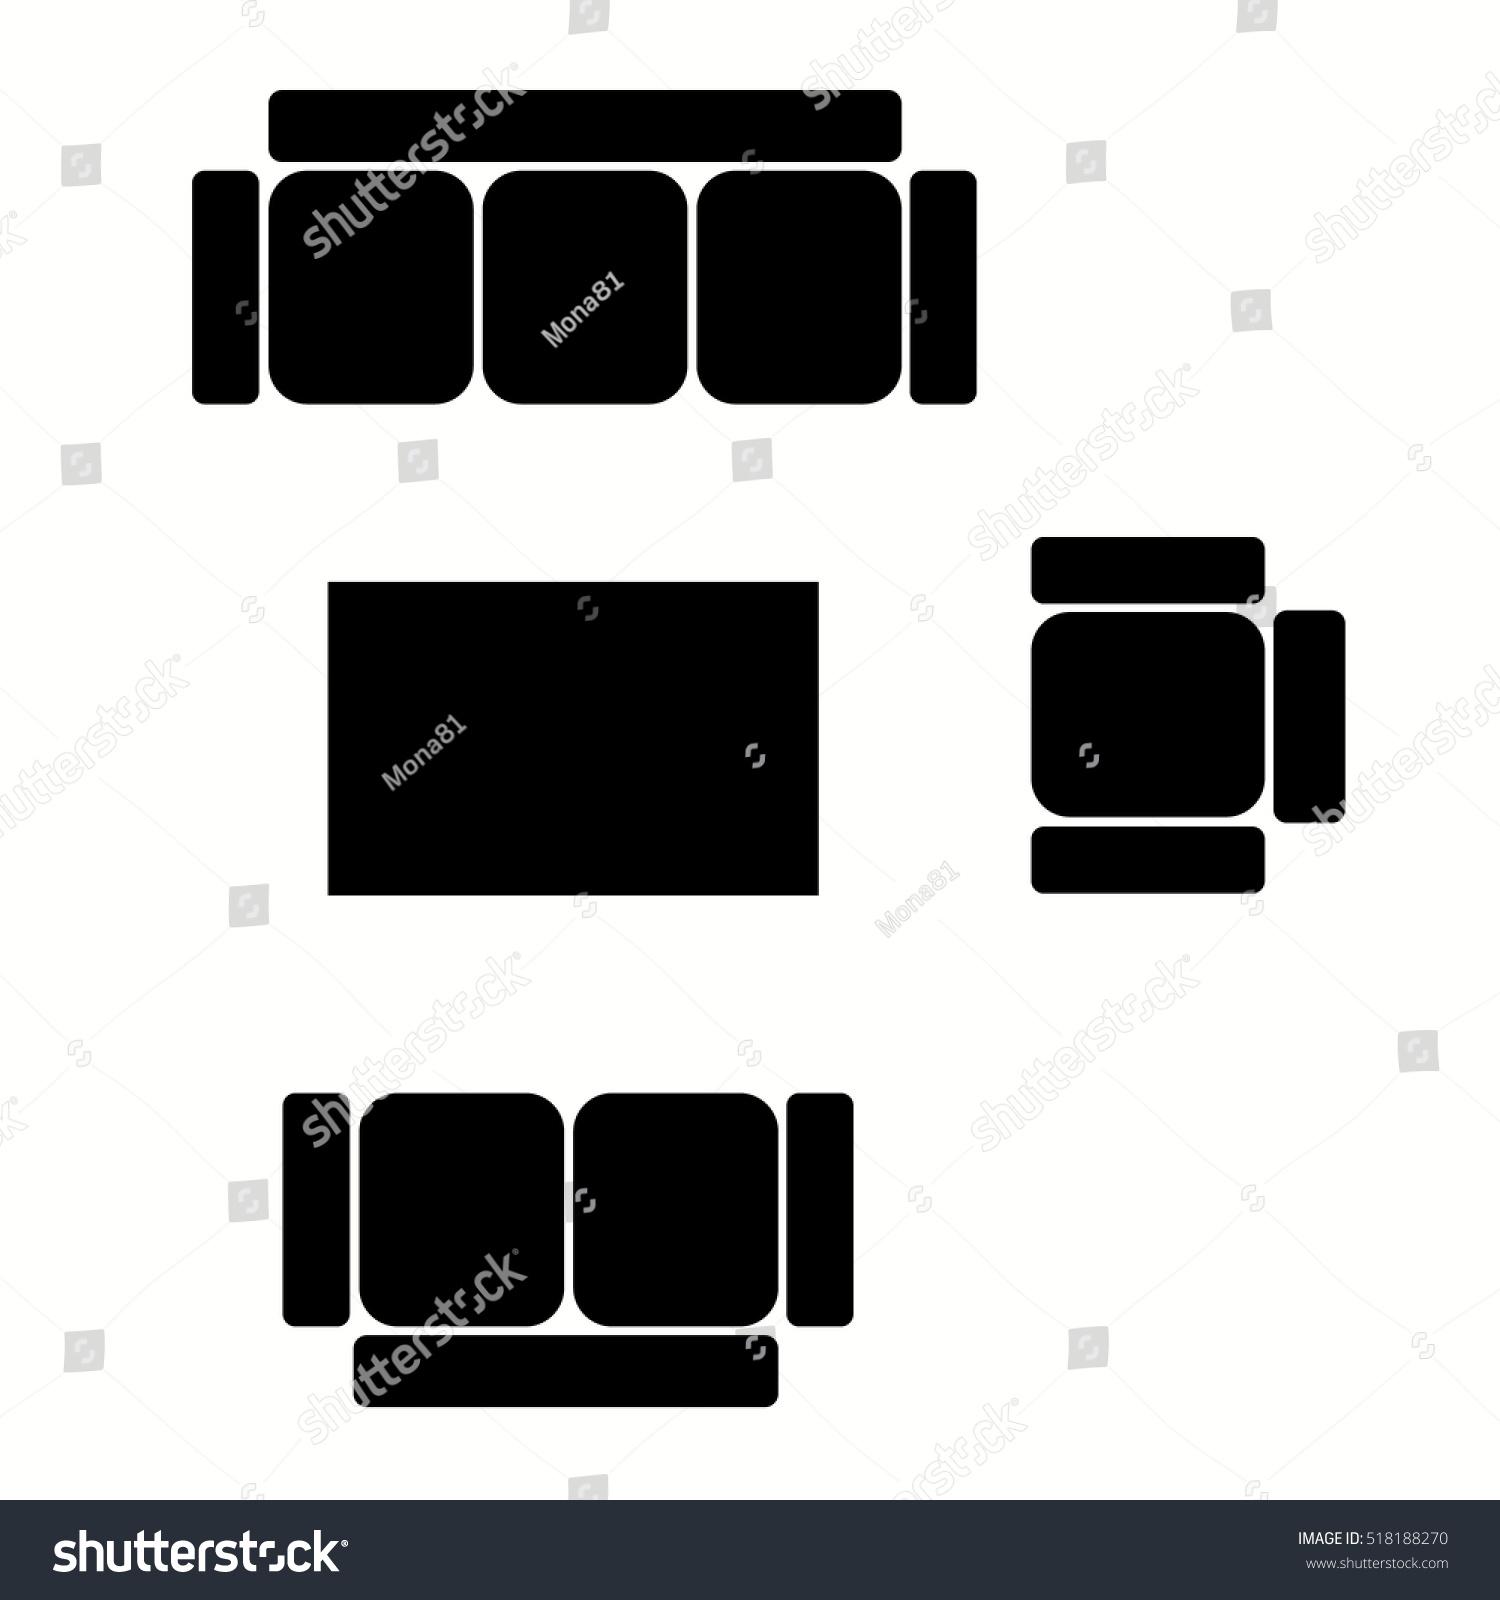 Top View Living Room Furniture Symbols Stock Photo (Photo, Vector ...